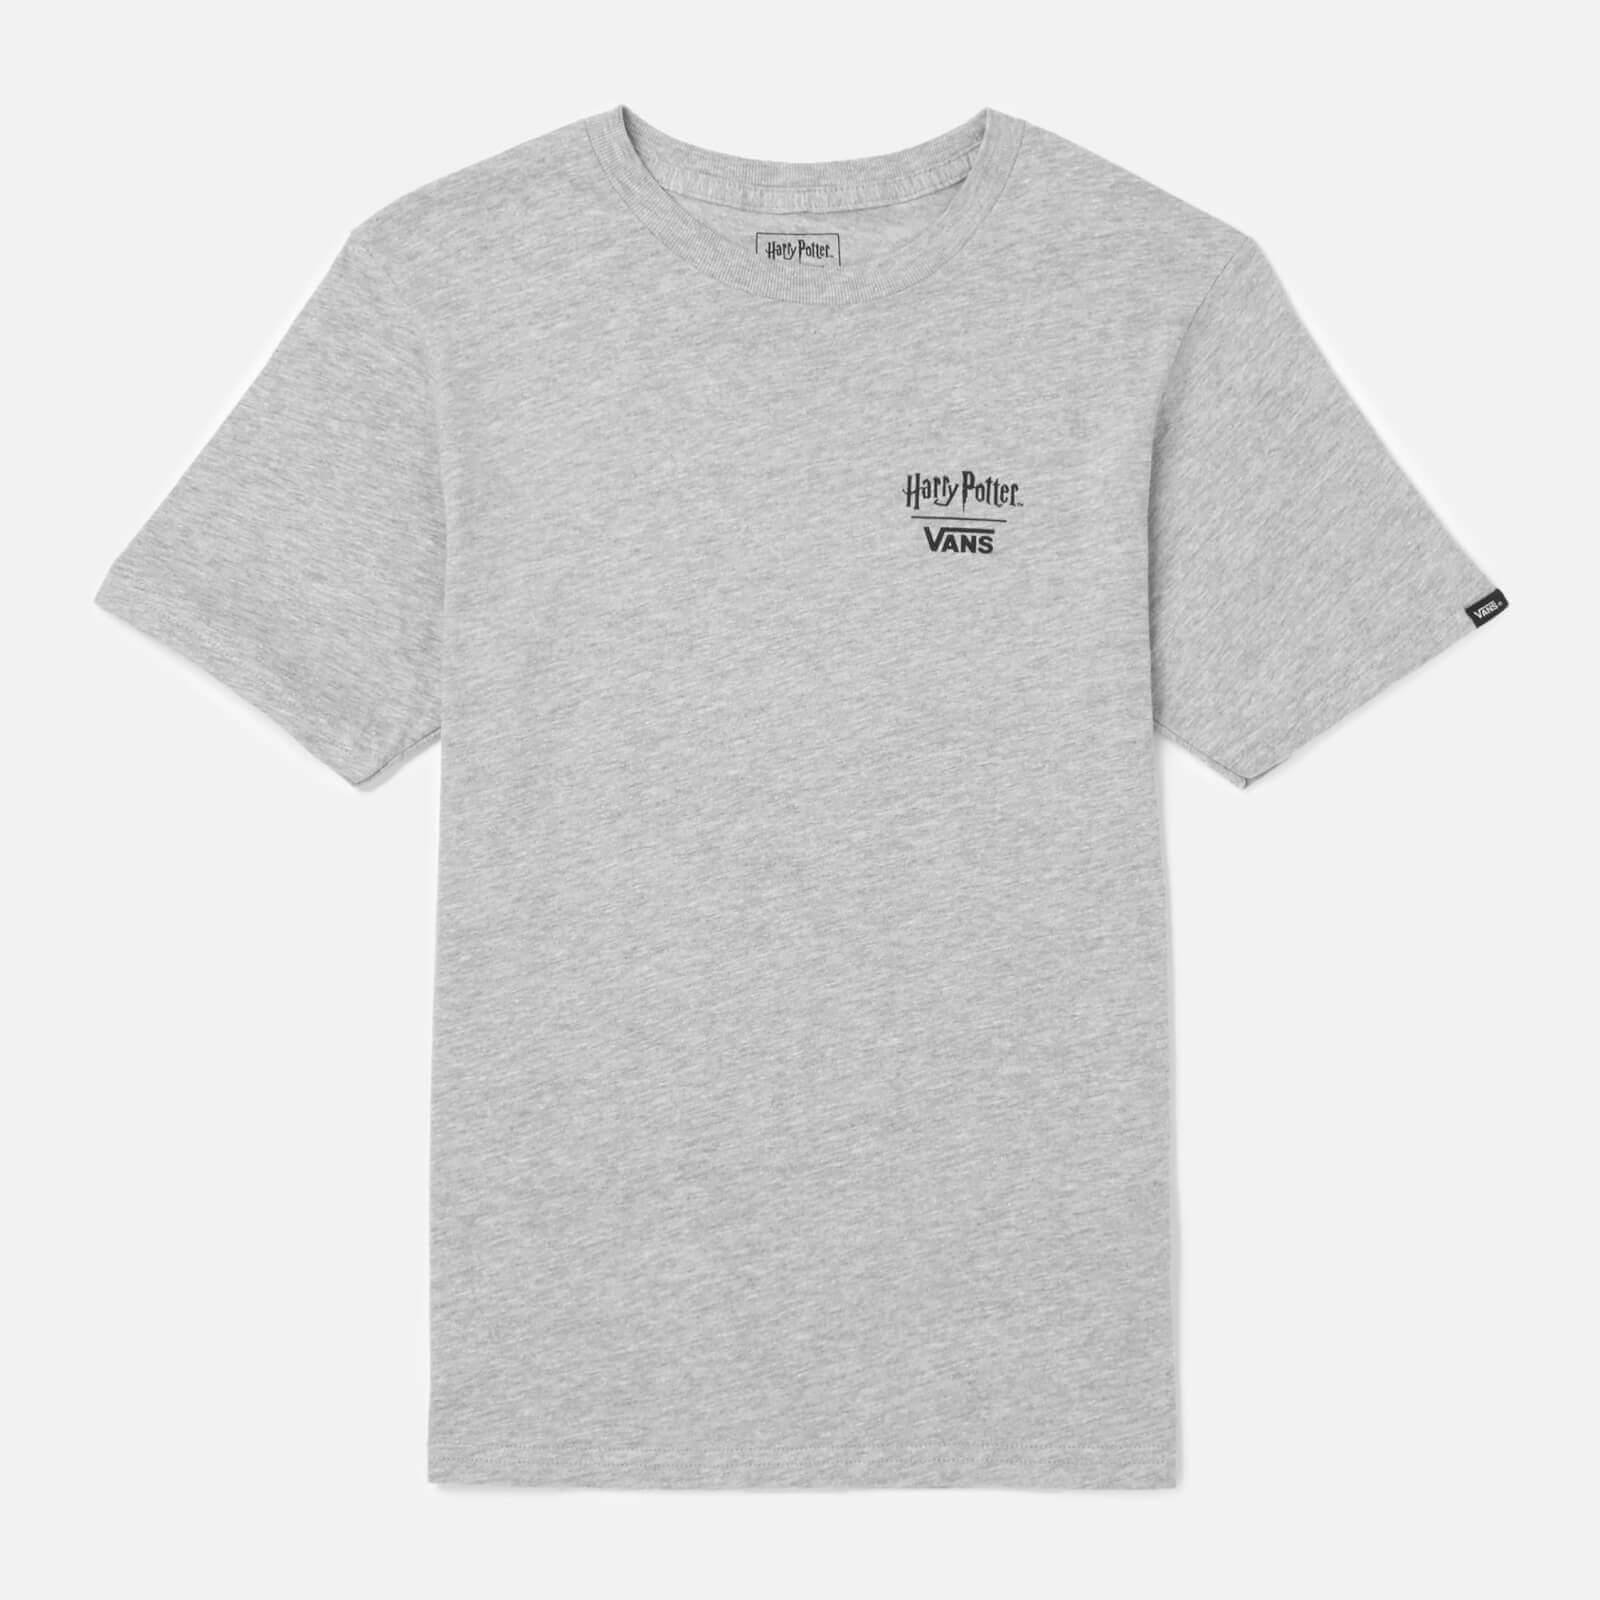 Vans X Harry Potter Kid's Crest T-Shirt - Heather - XL - Grey